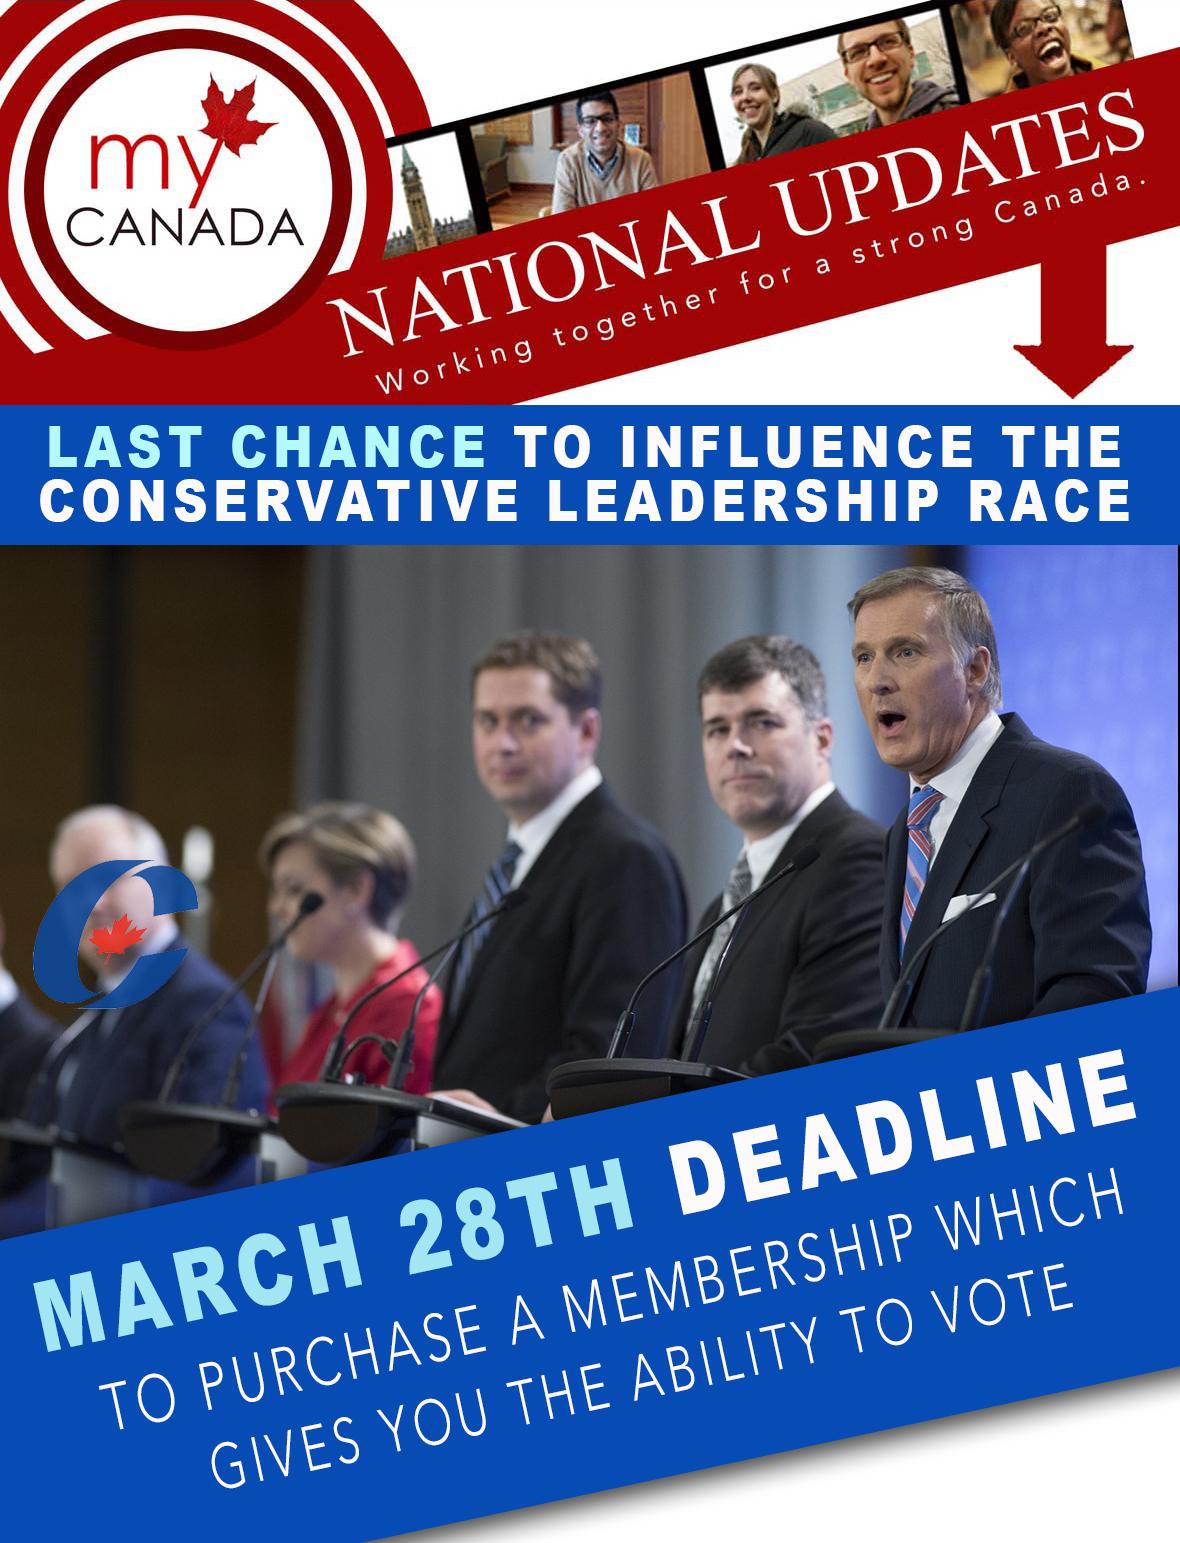 ConservativeLeadershipLastChance